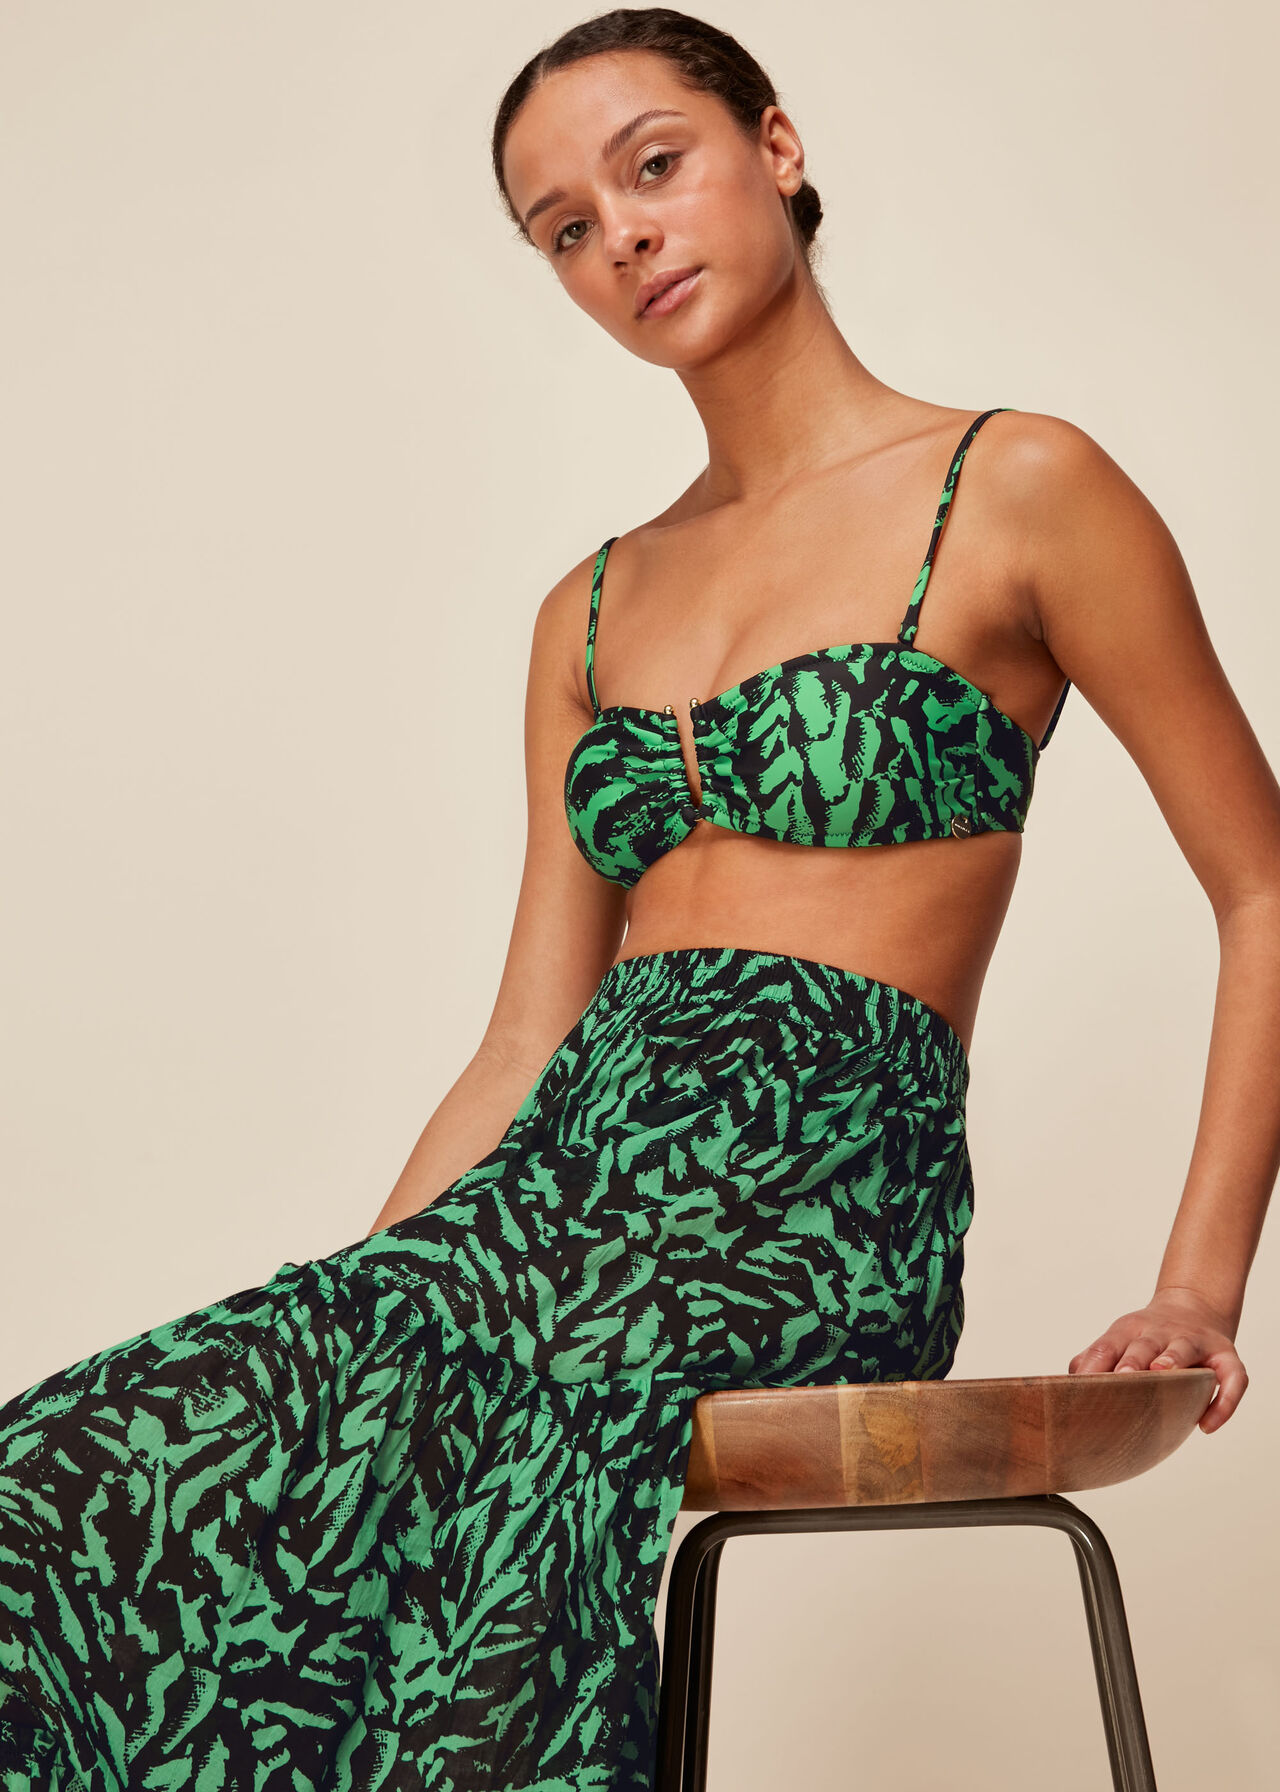 Tiger Animal Print Beach Skirt